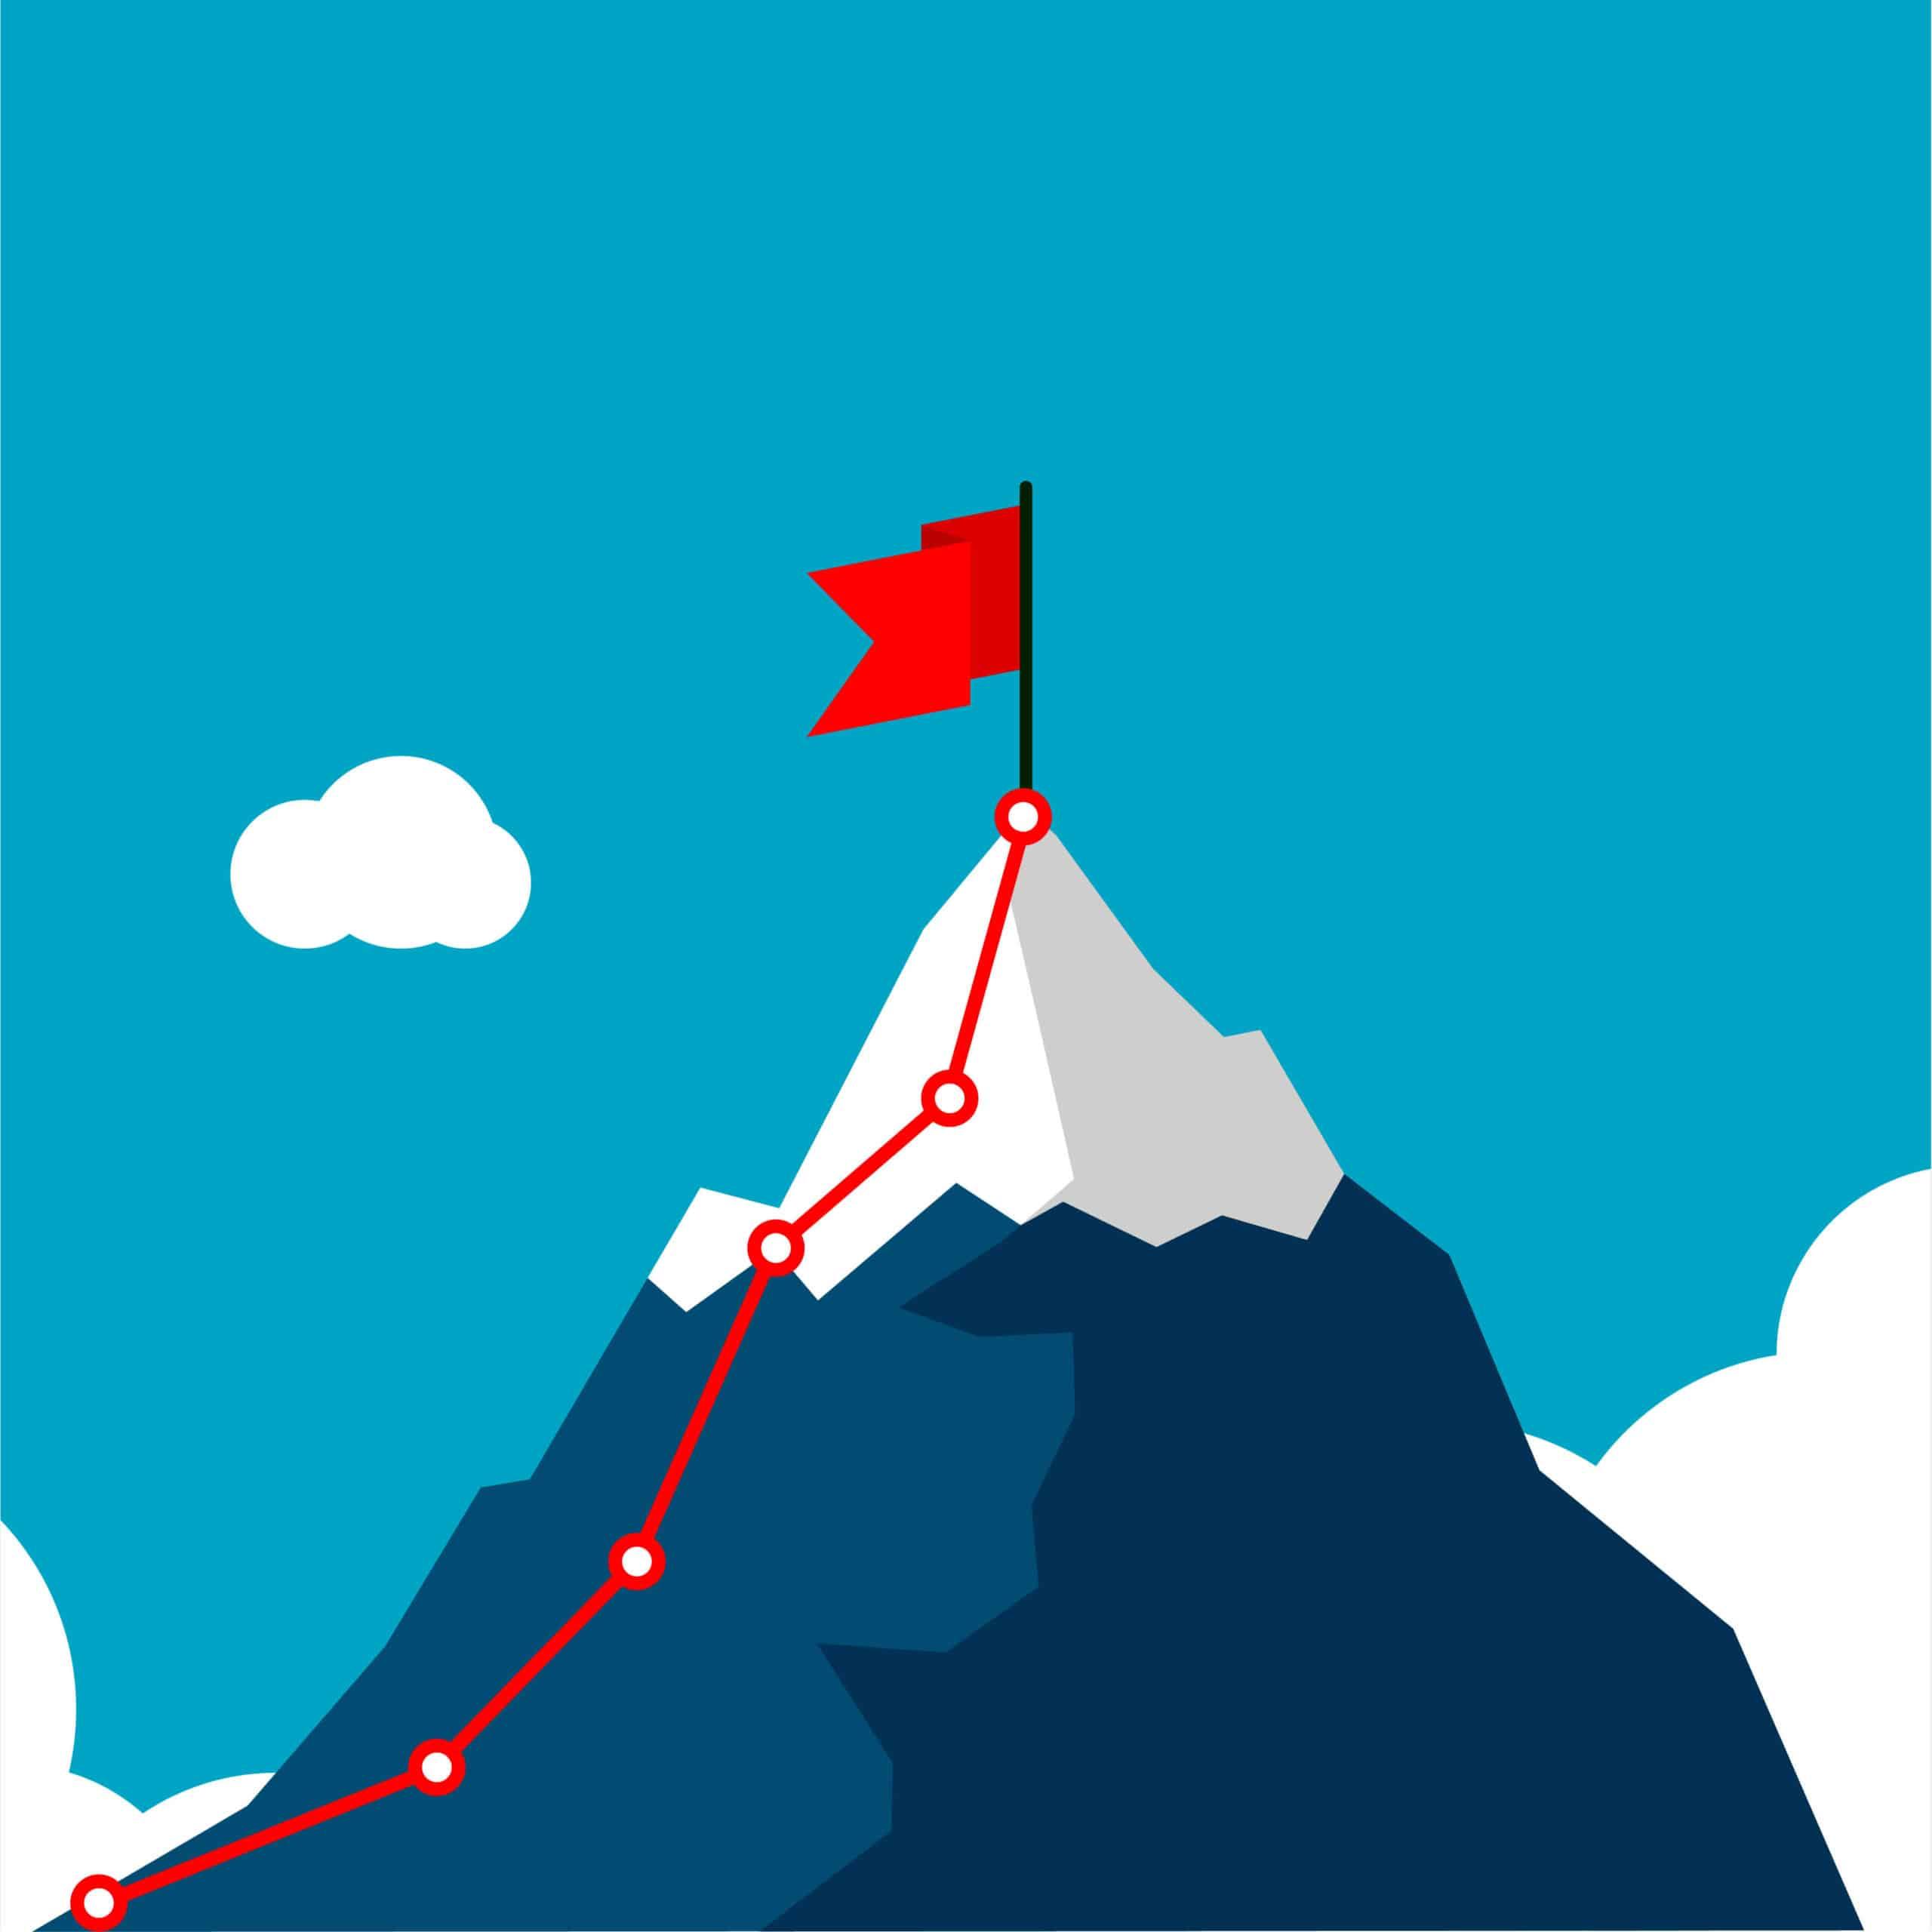 sales techniques in 2020, agile sales marketing tactics, agile marketing tips, sales and marketing for beginners